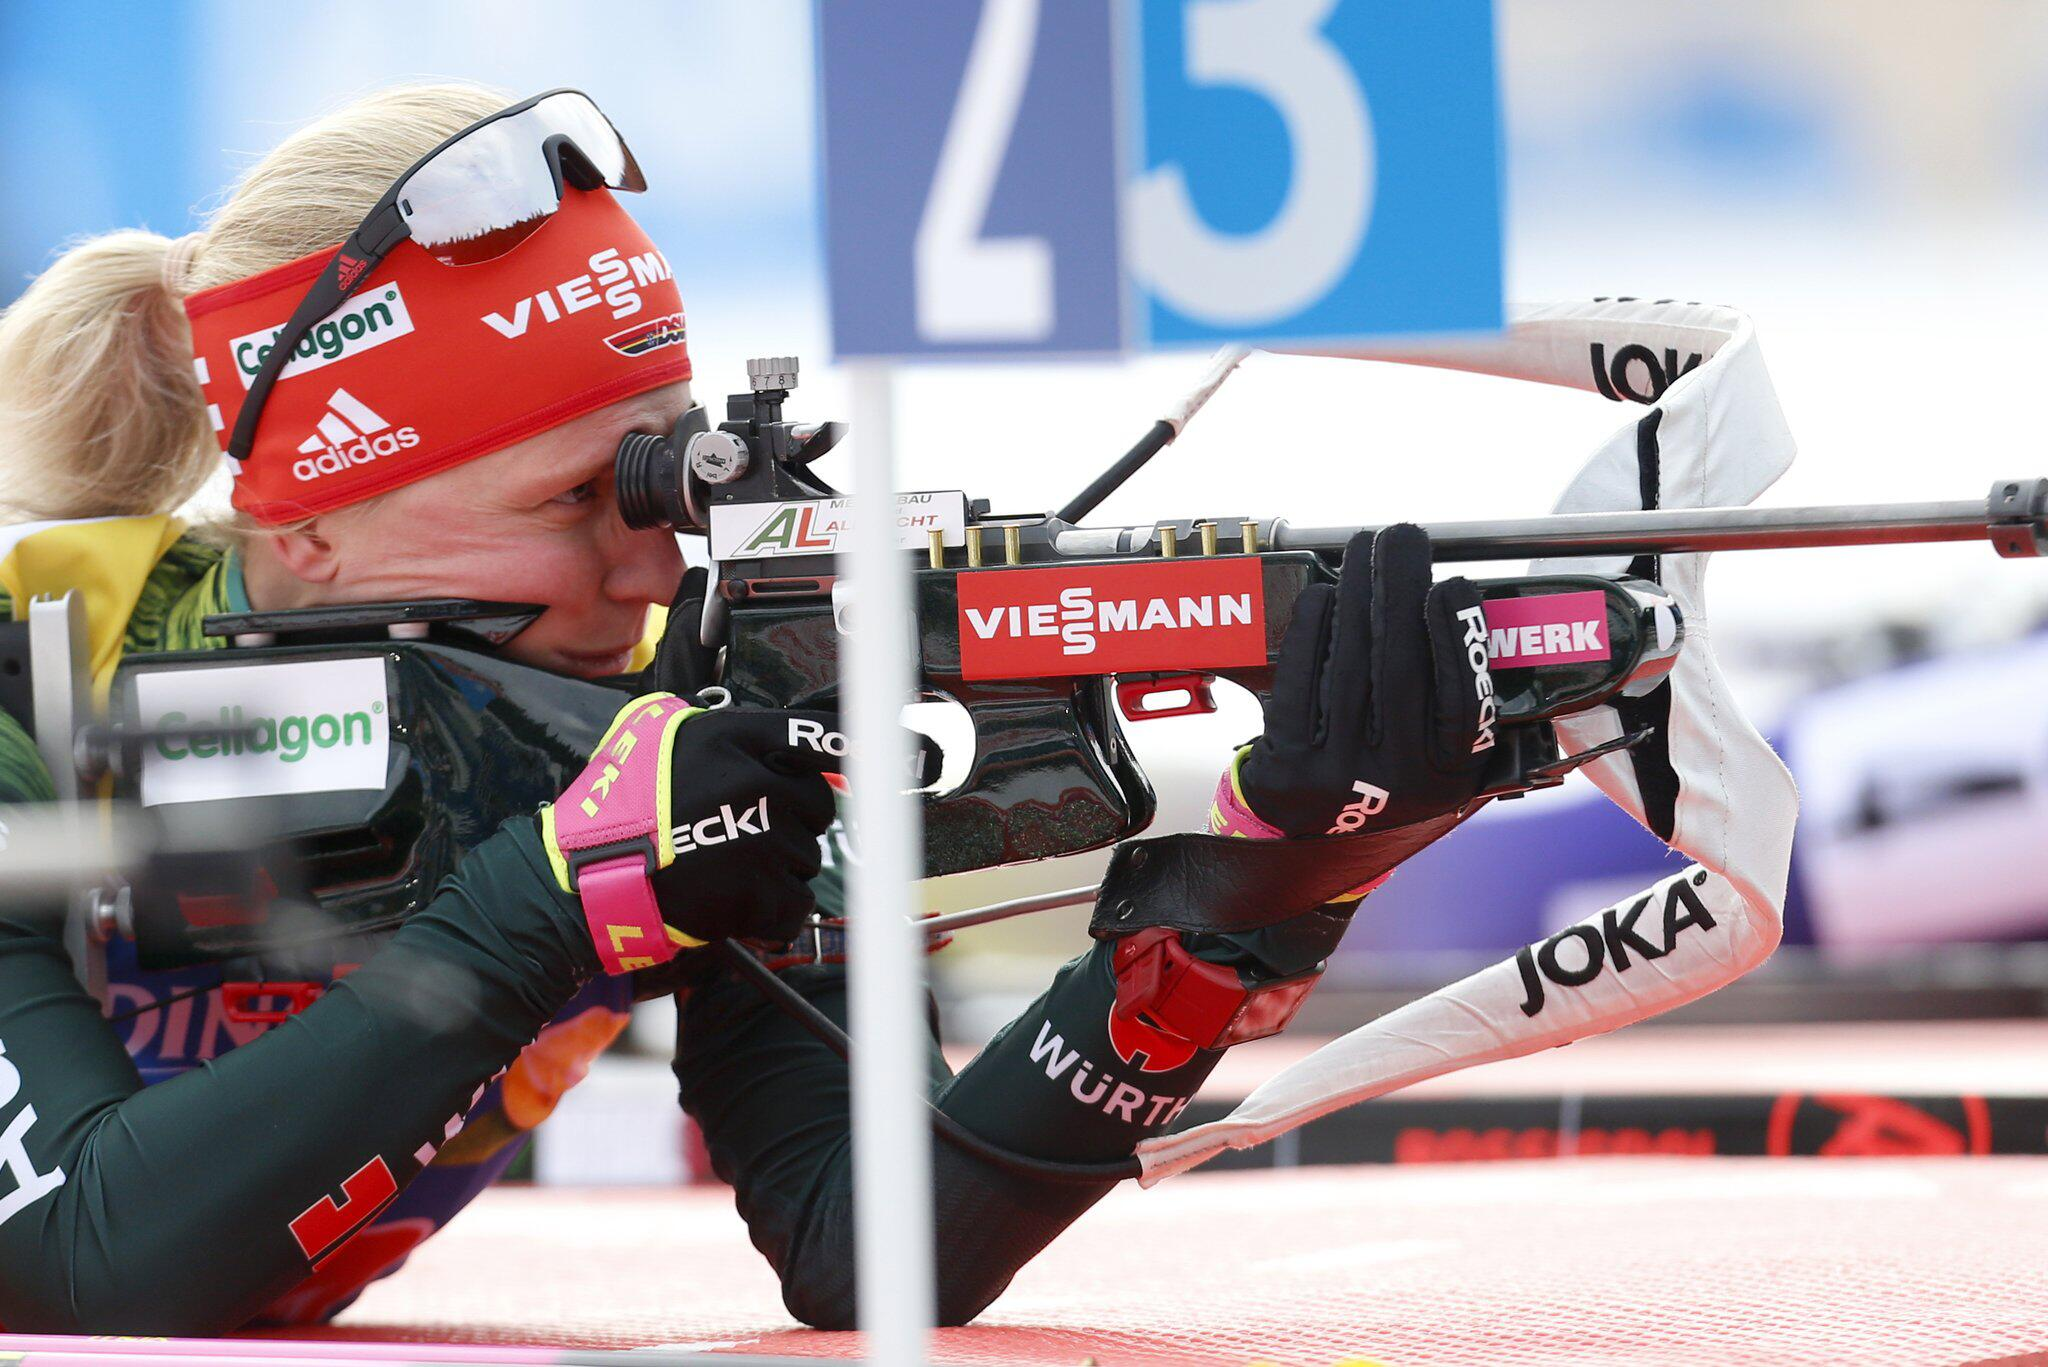 Bild zu Biathlon, Weltcup, Slowenien, Pokljuka, Franziska Hildebrand, Mixed, Staffel